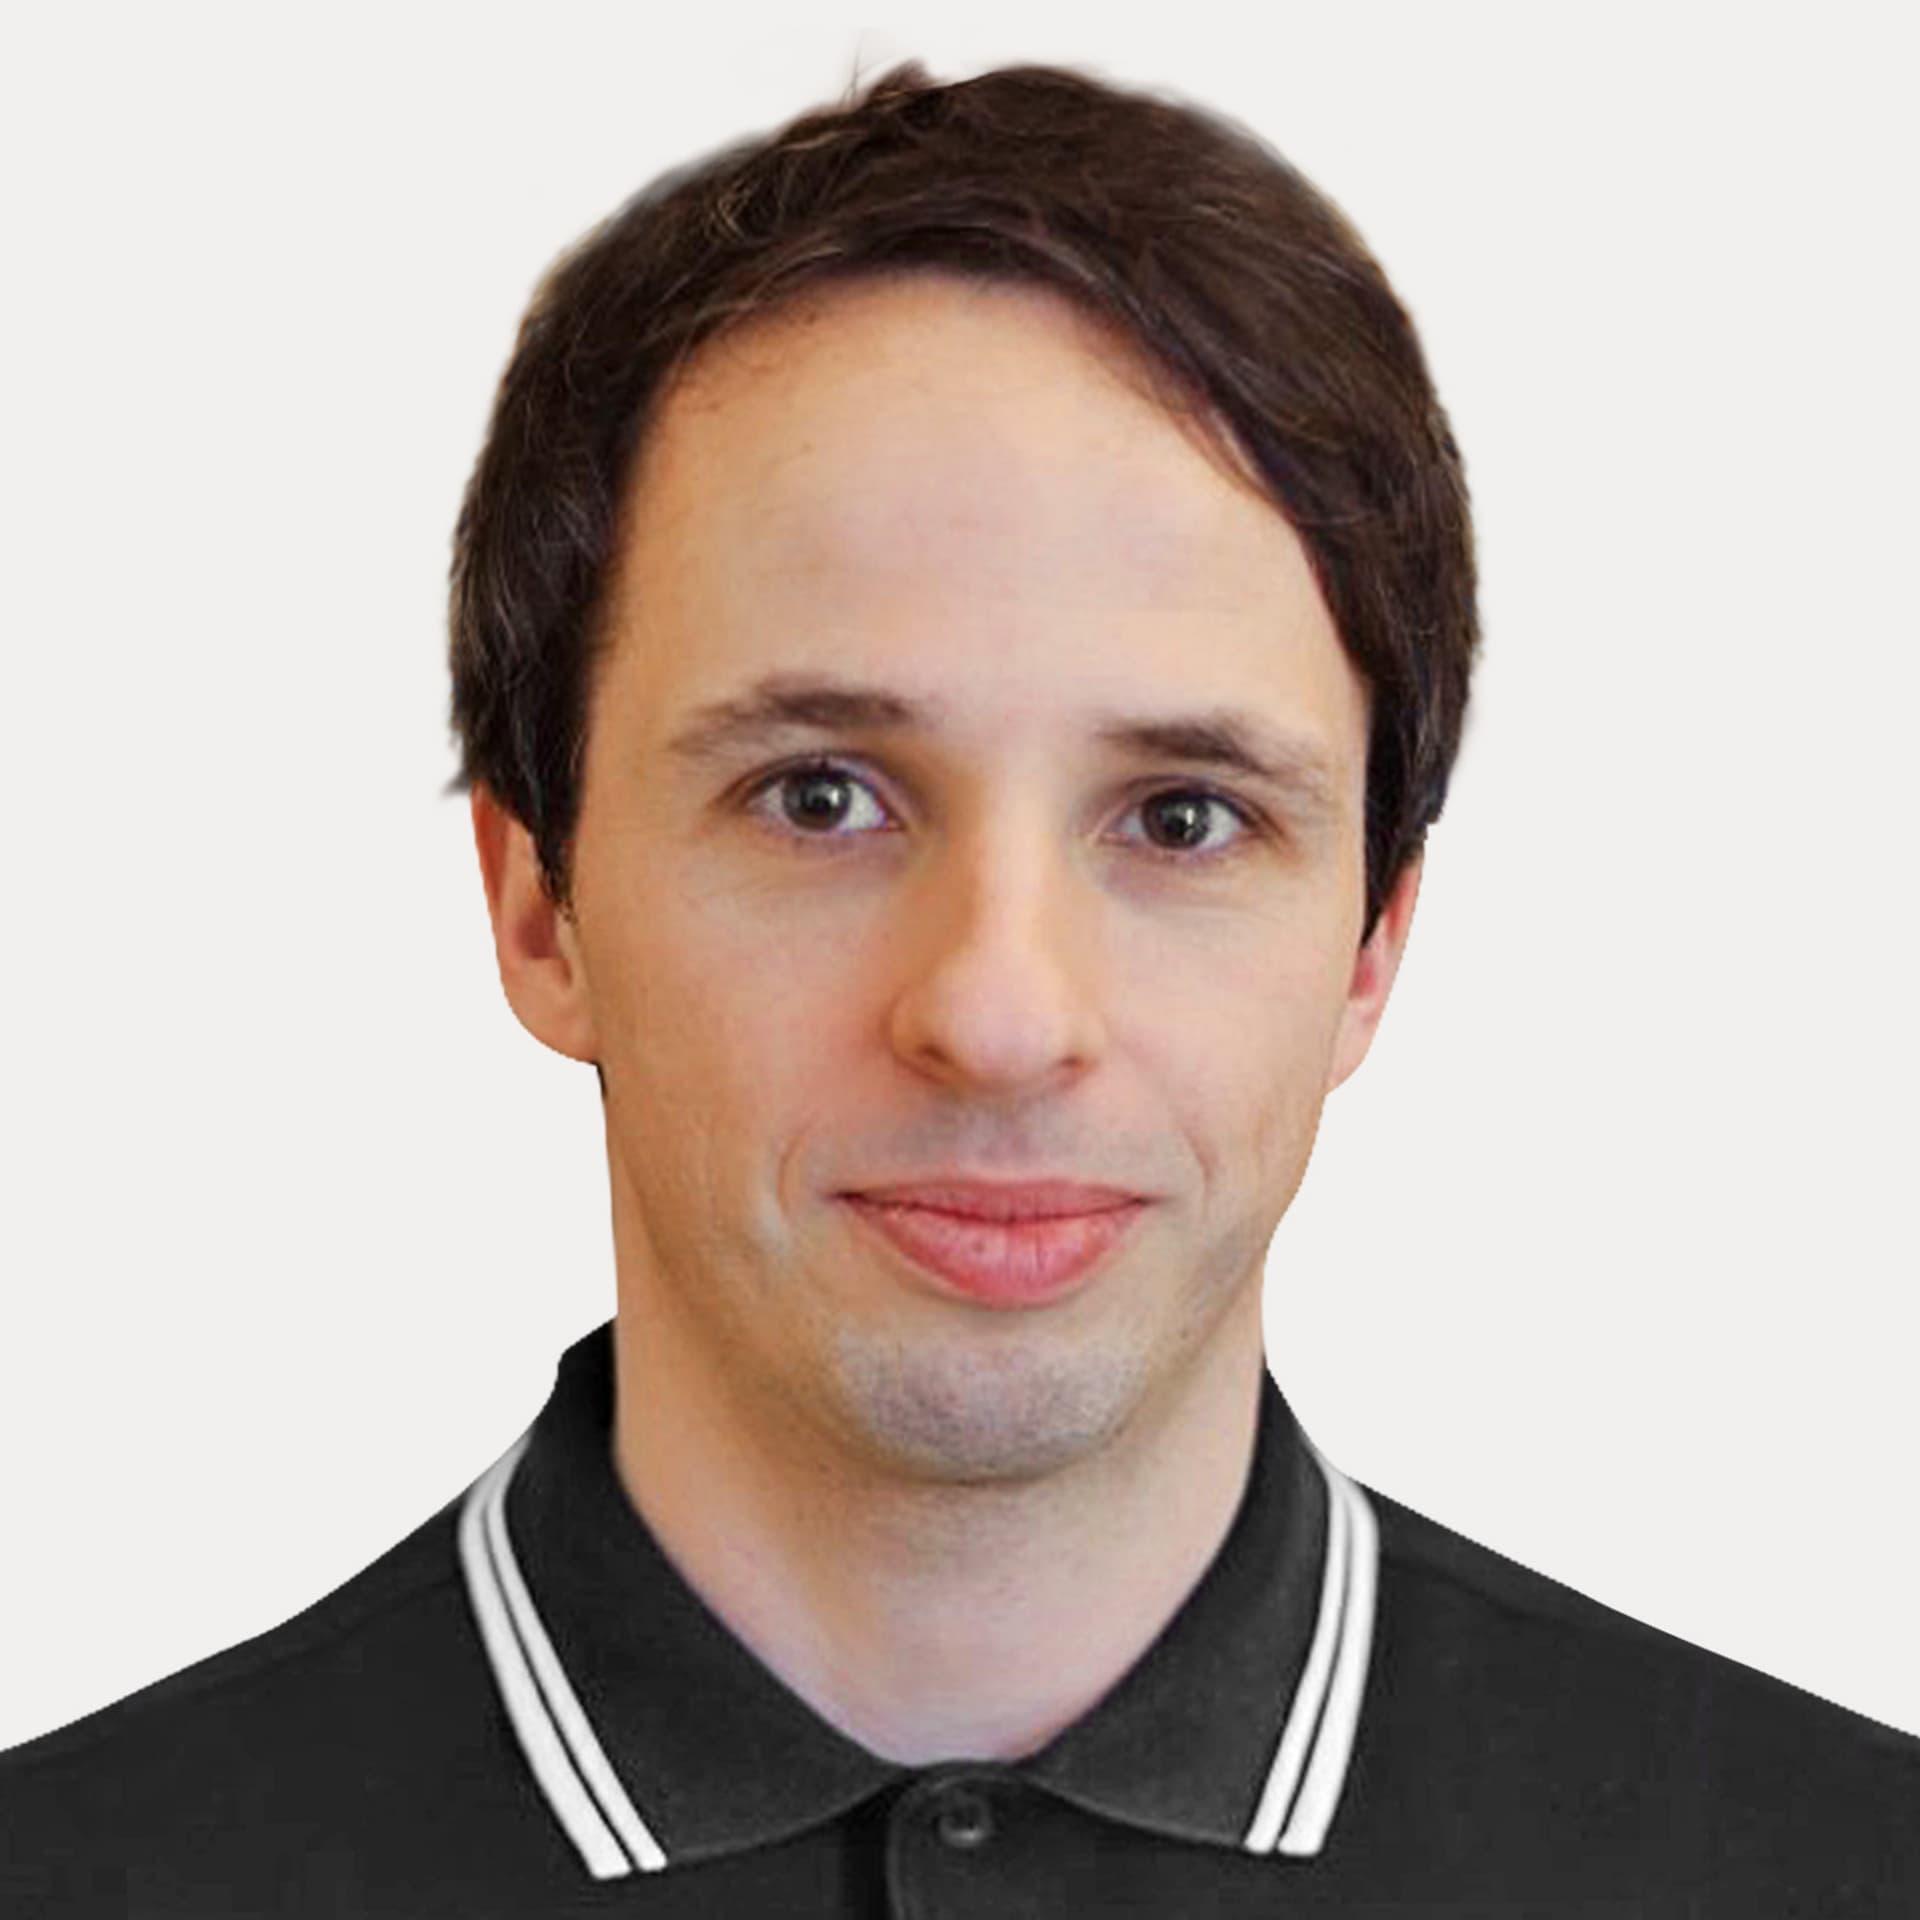 Michael Stahl